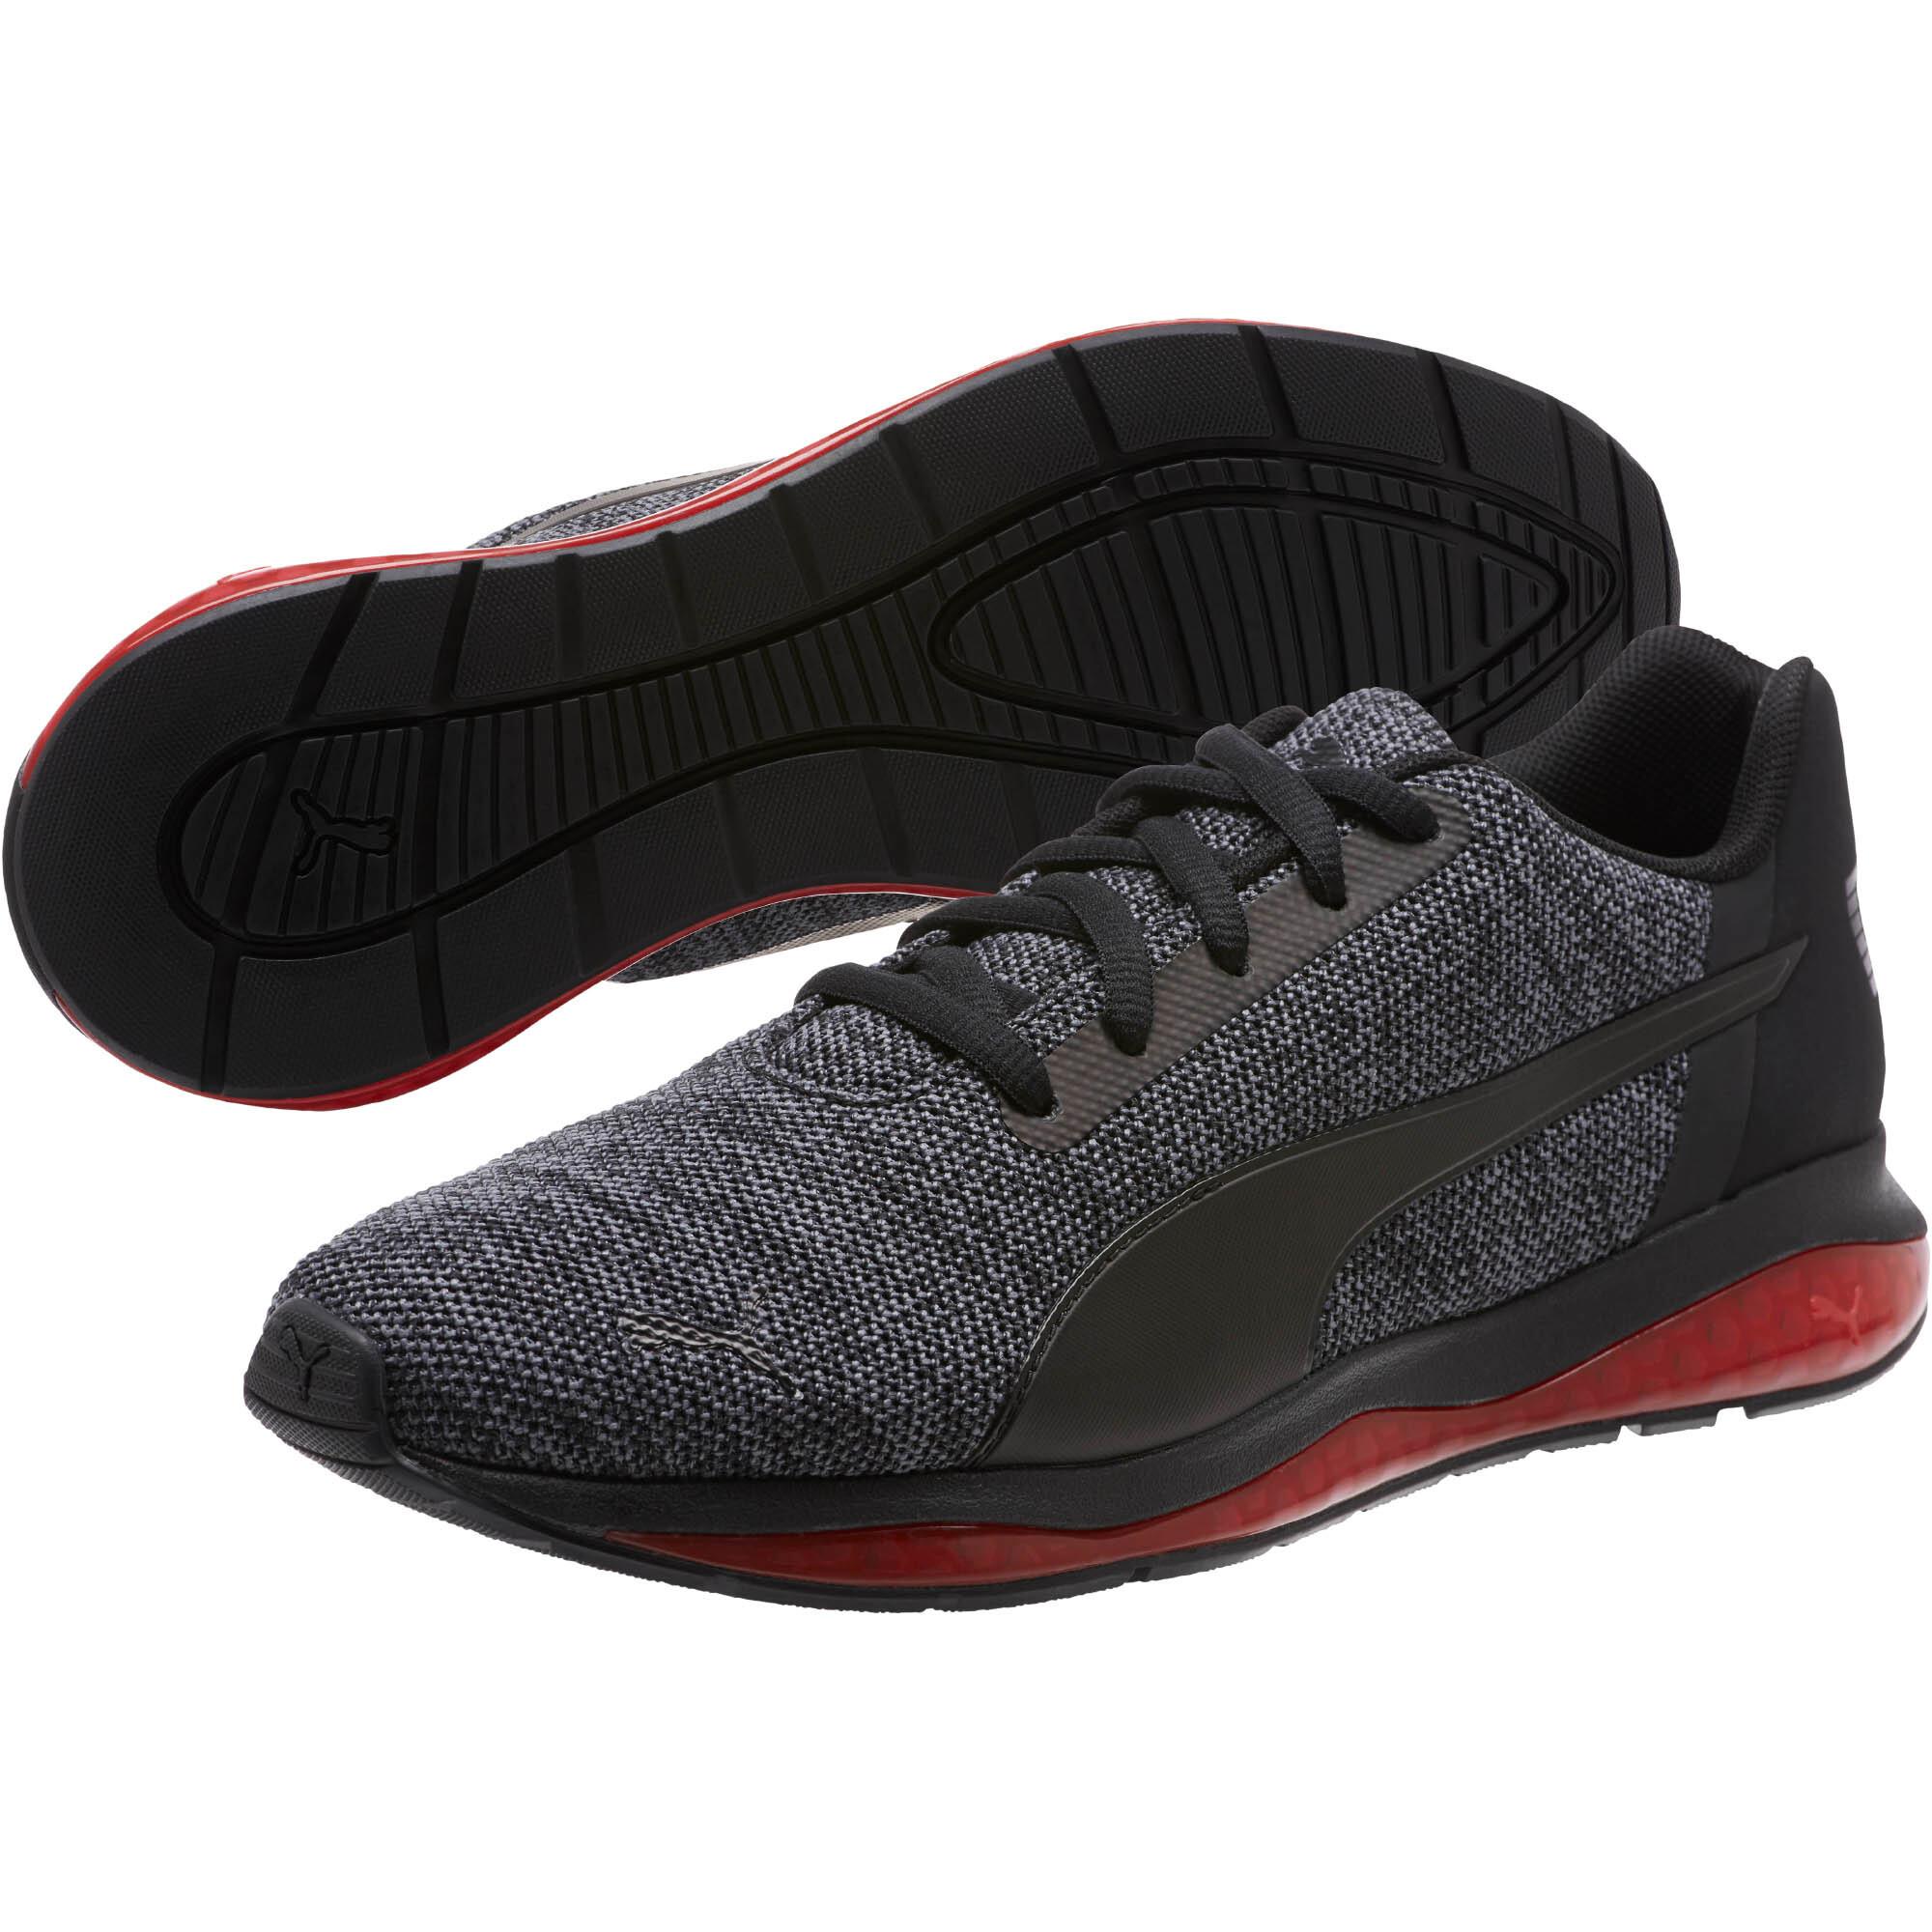 Men's PUMA Sneakers & Athletic Shoes | 6pm